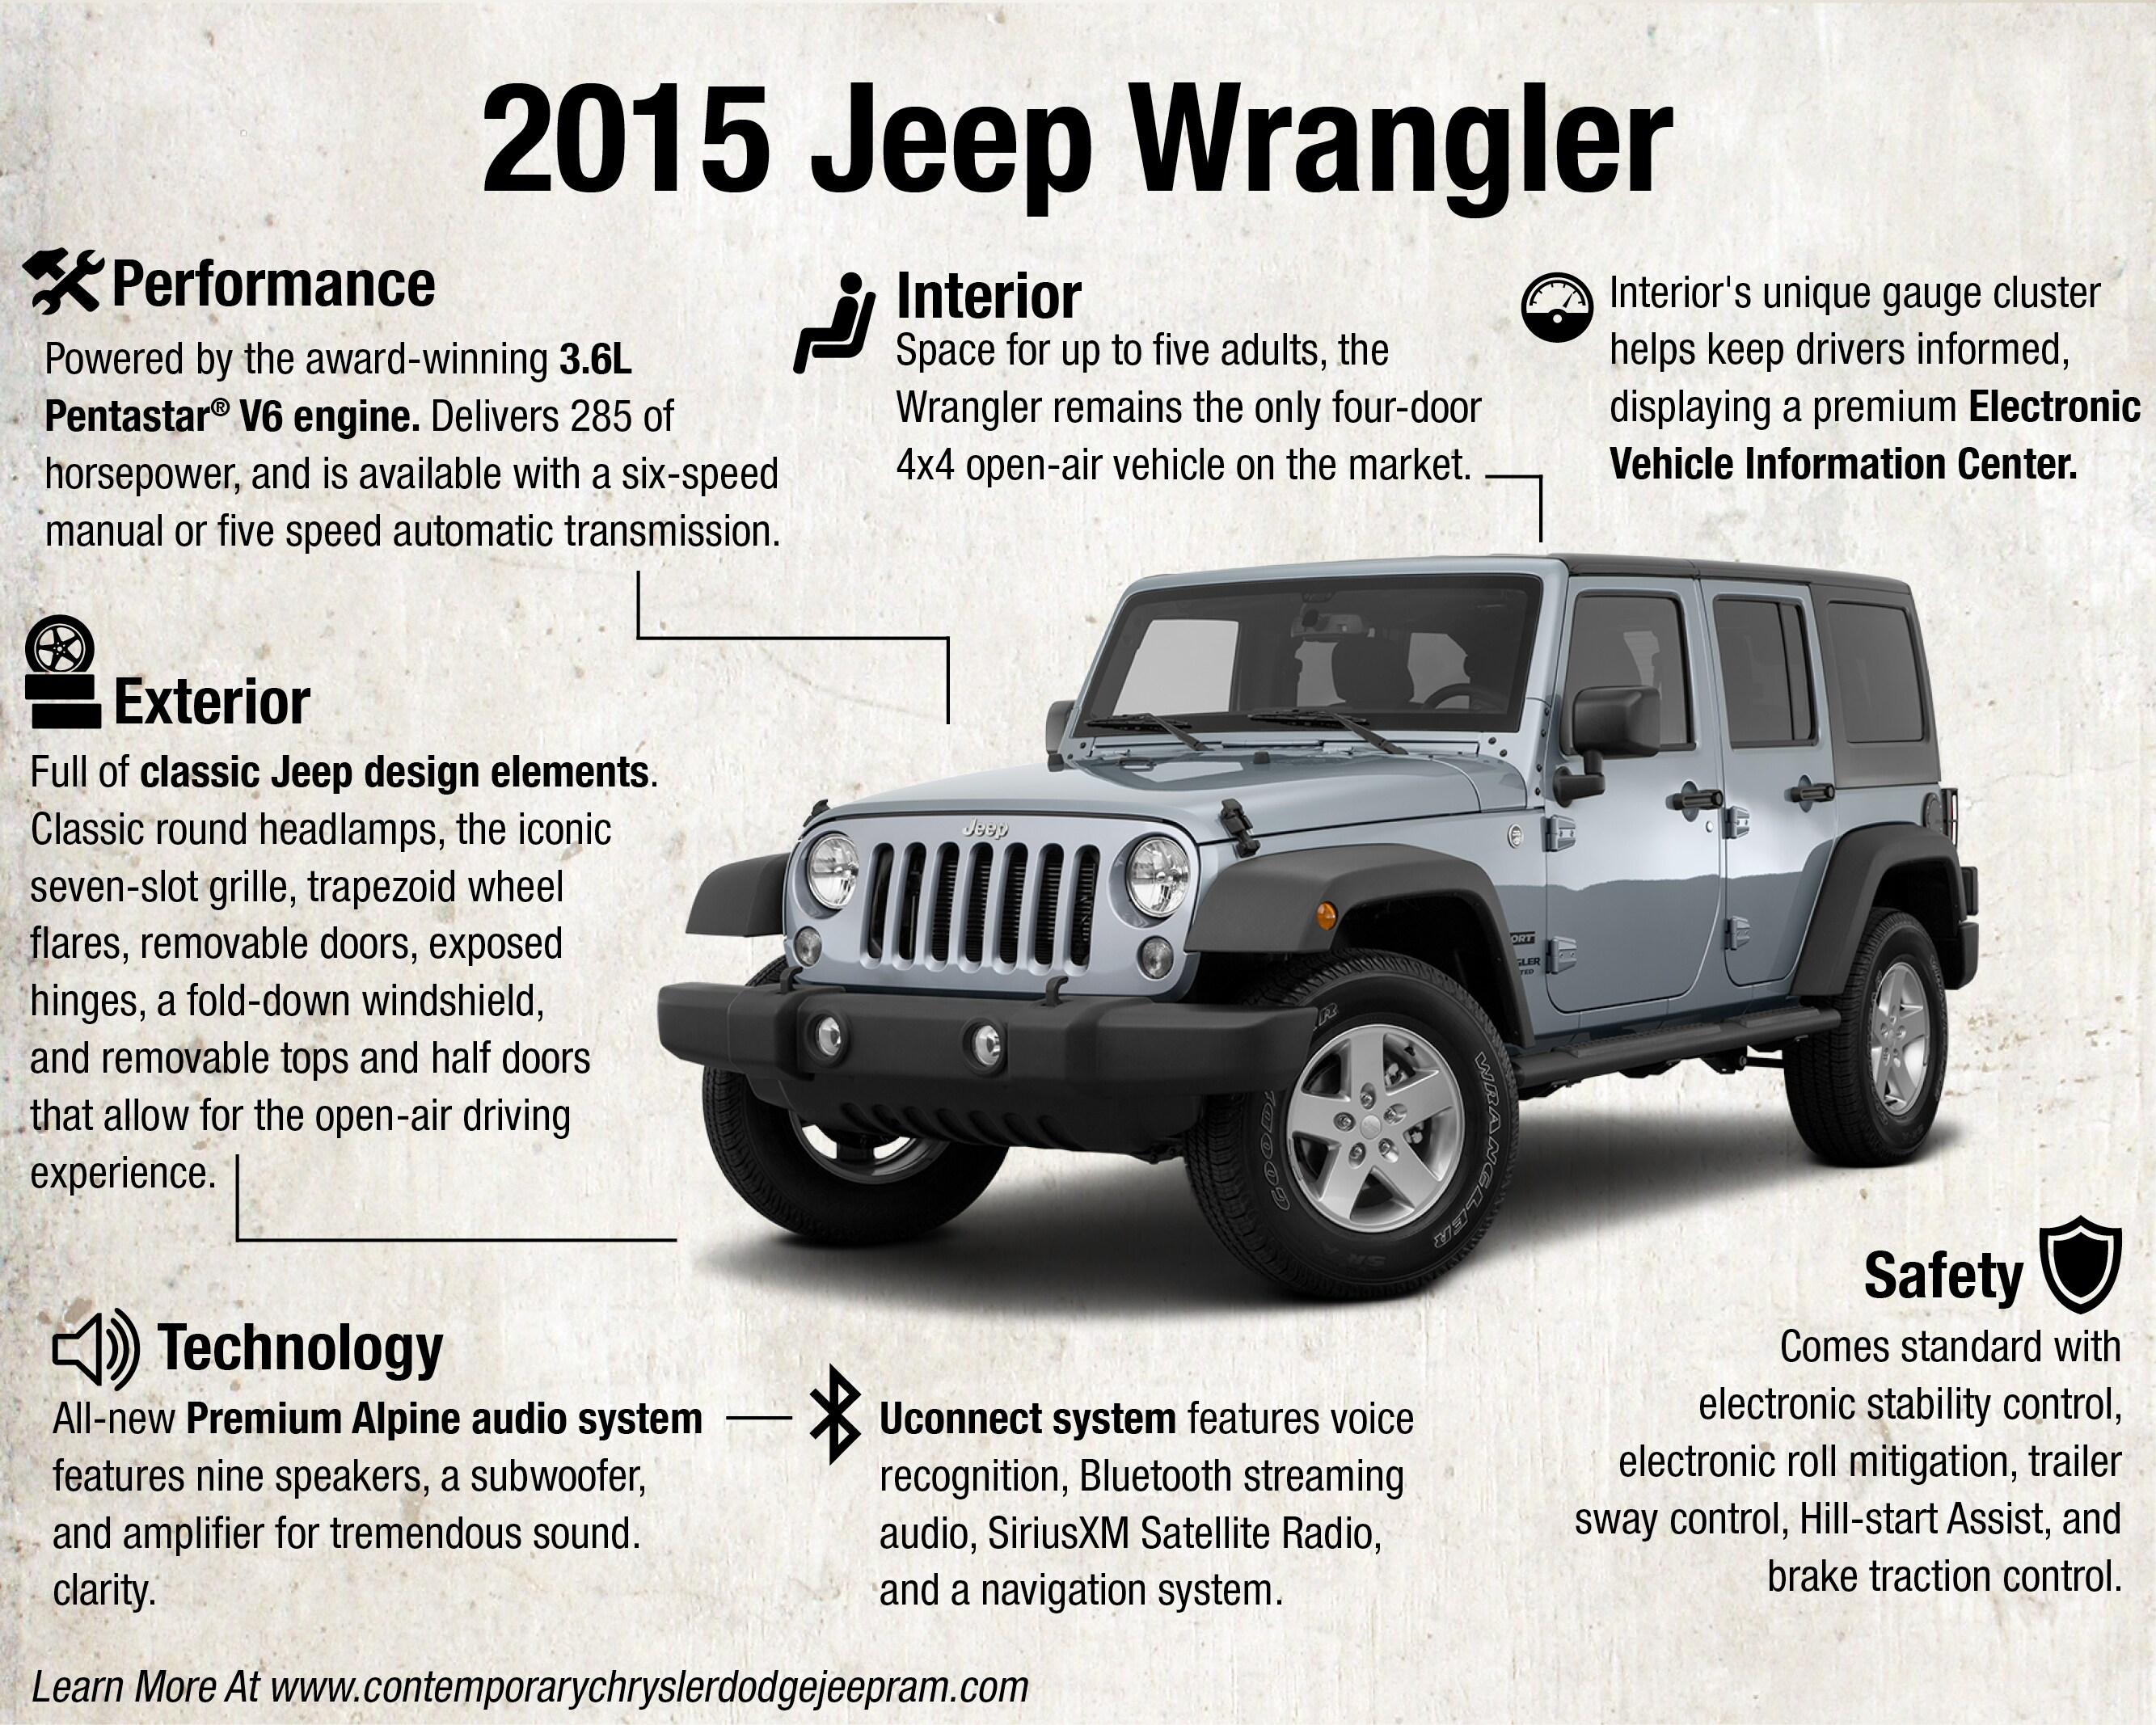 2015 jeep wrangler new hampshire new hampshire jeep dealer. Black Bedroom Furniture Sets. Home Design Ideas